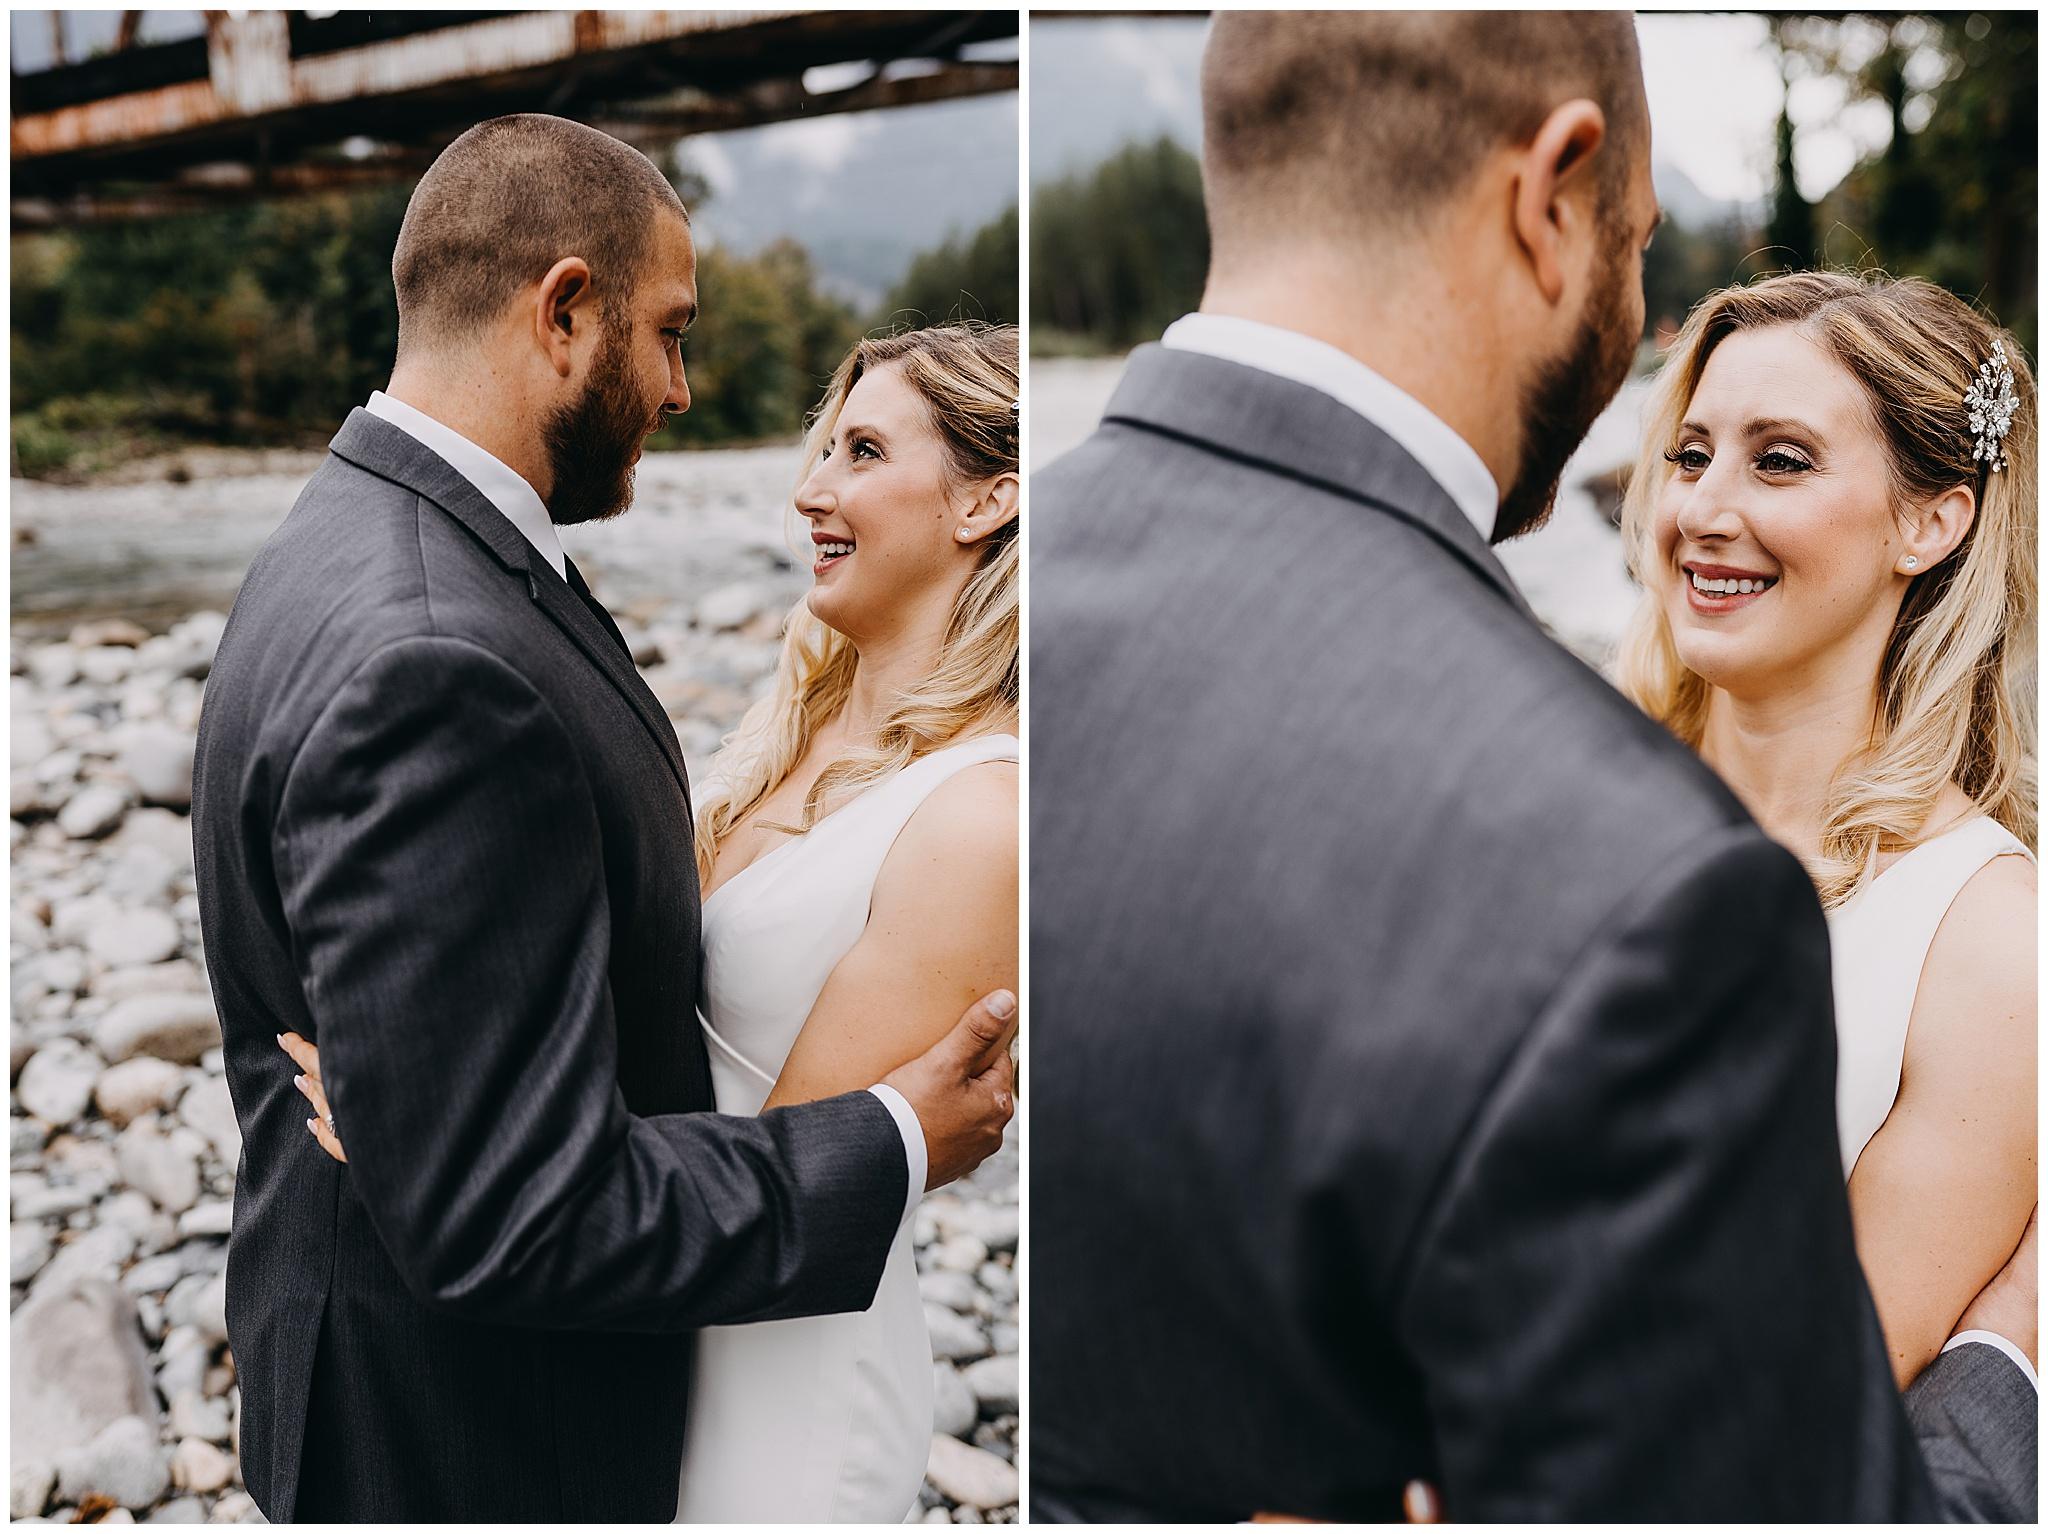 index-wa-wedding23.jpg